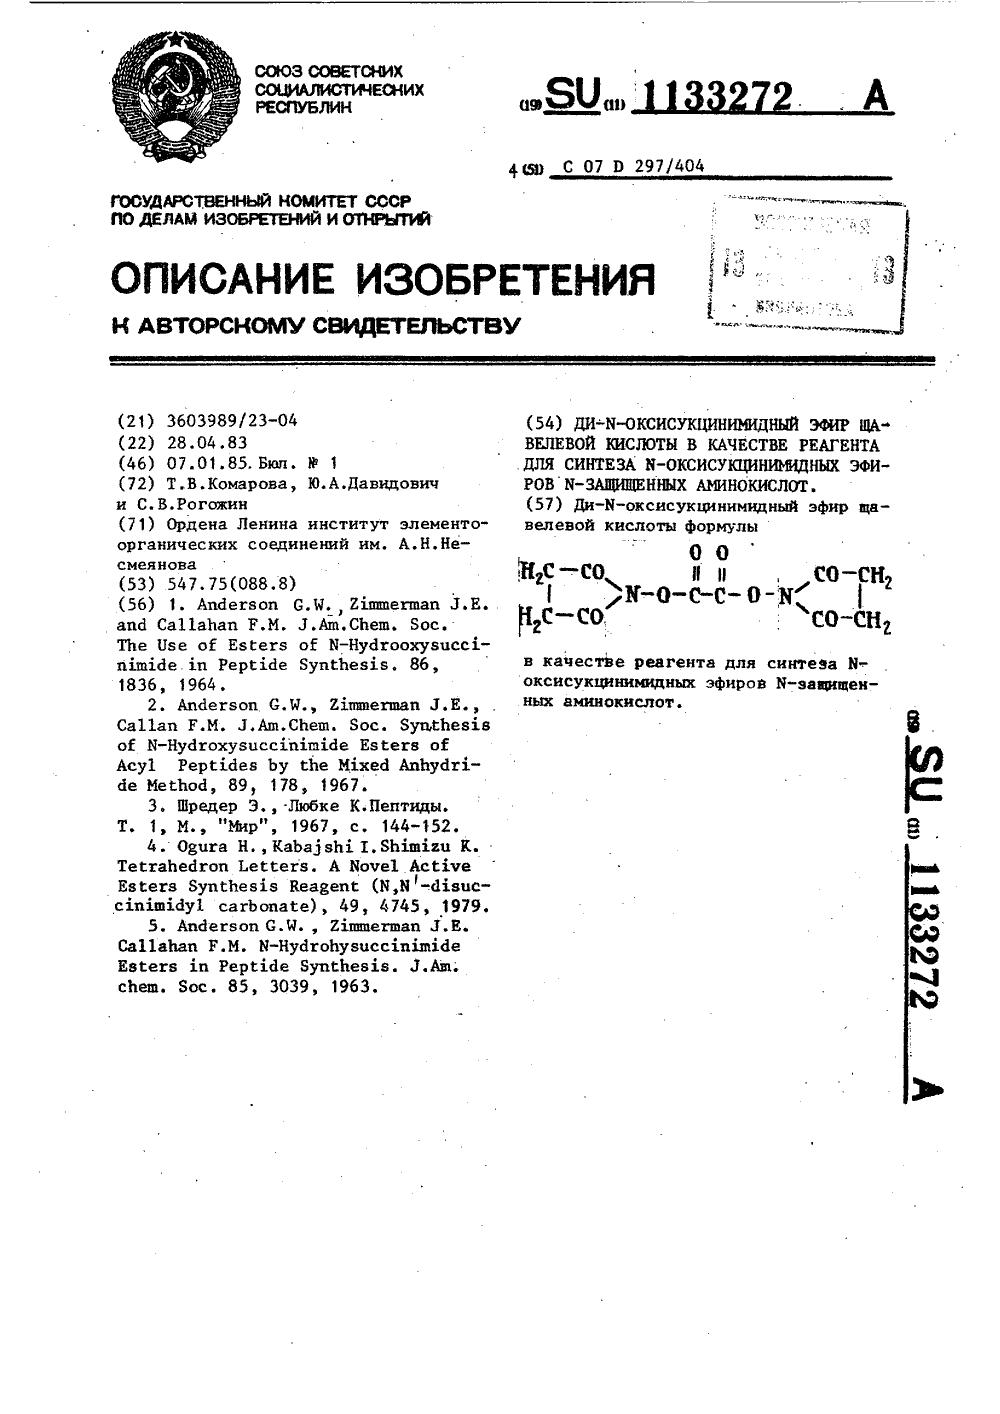 Шредер э., любке к.пептиды.м.мир, 1967 станозолол примоболан